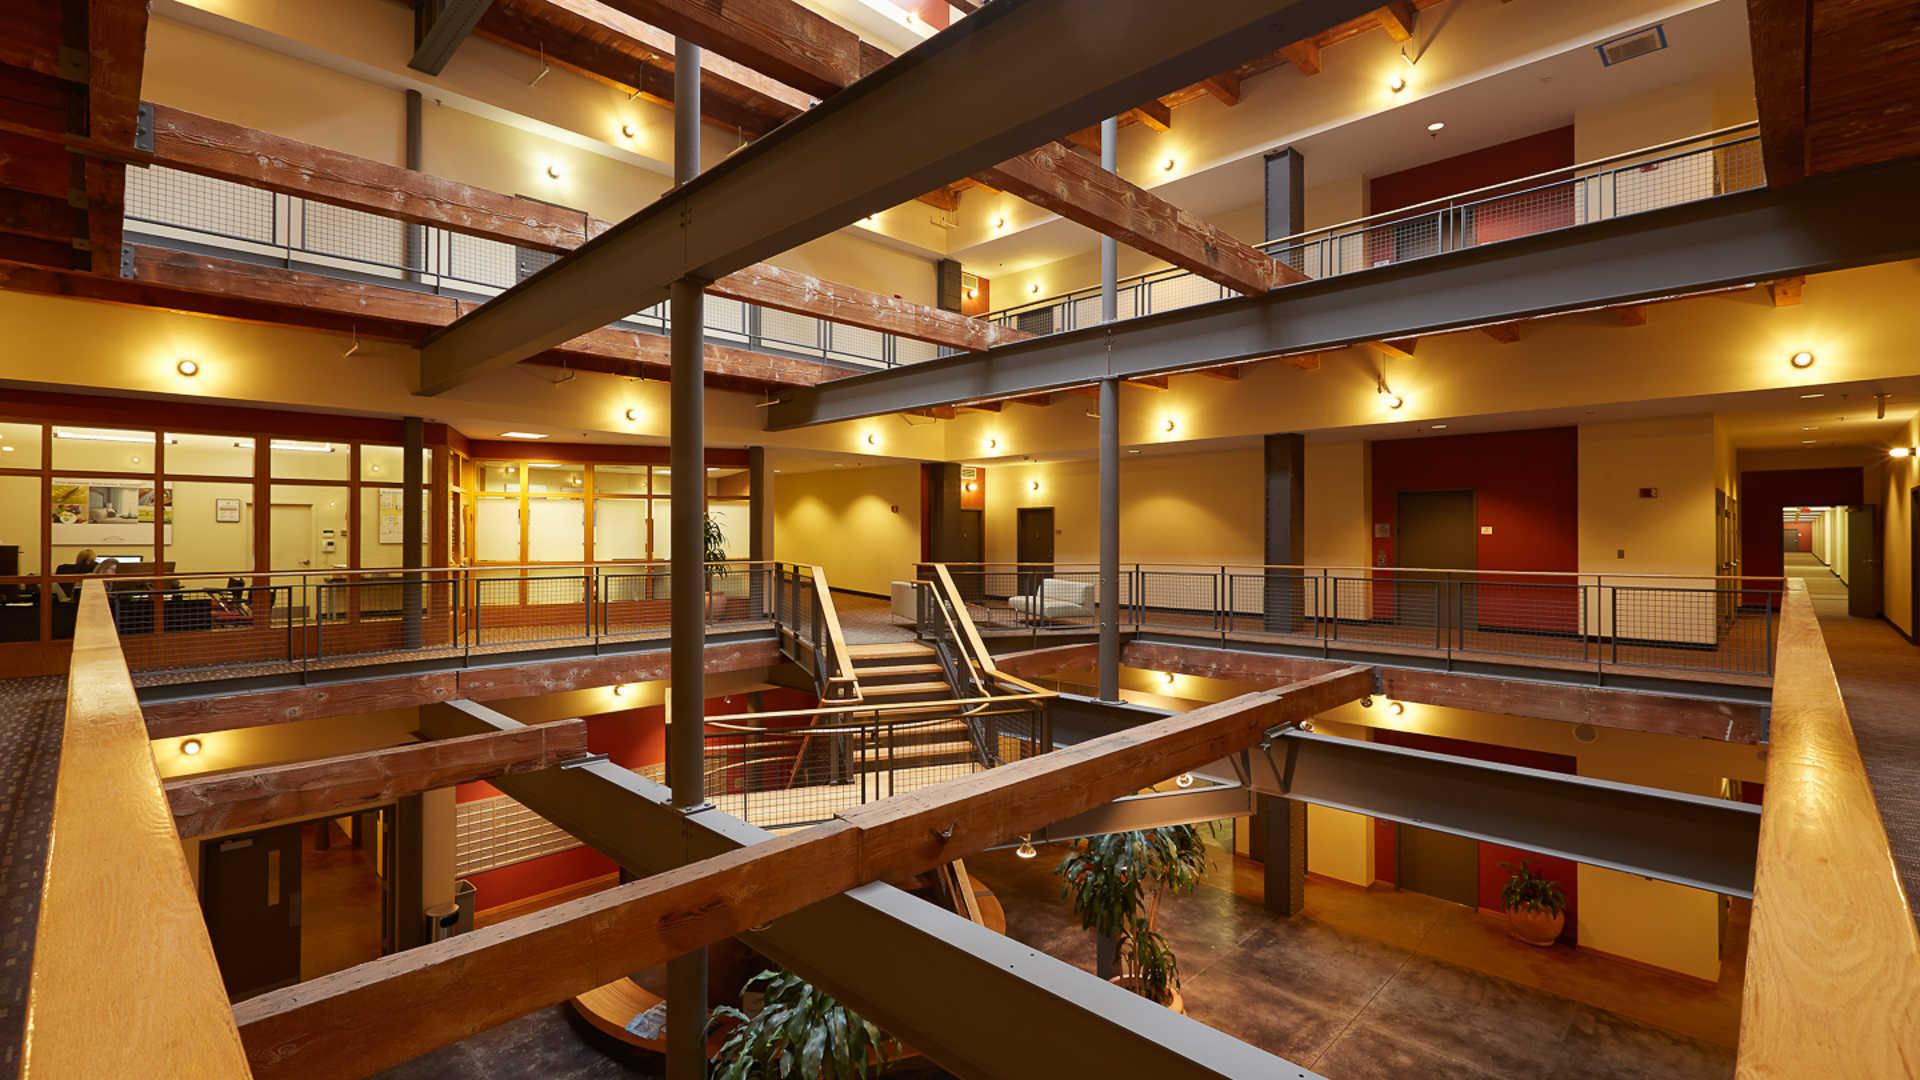 Lofts at kendall square apartments lobby